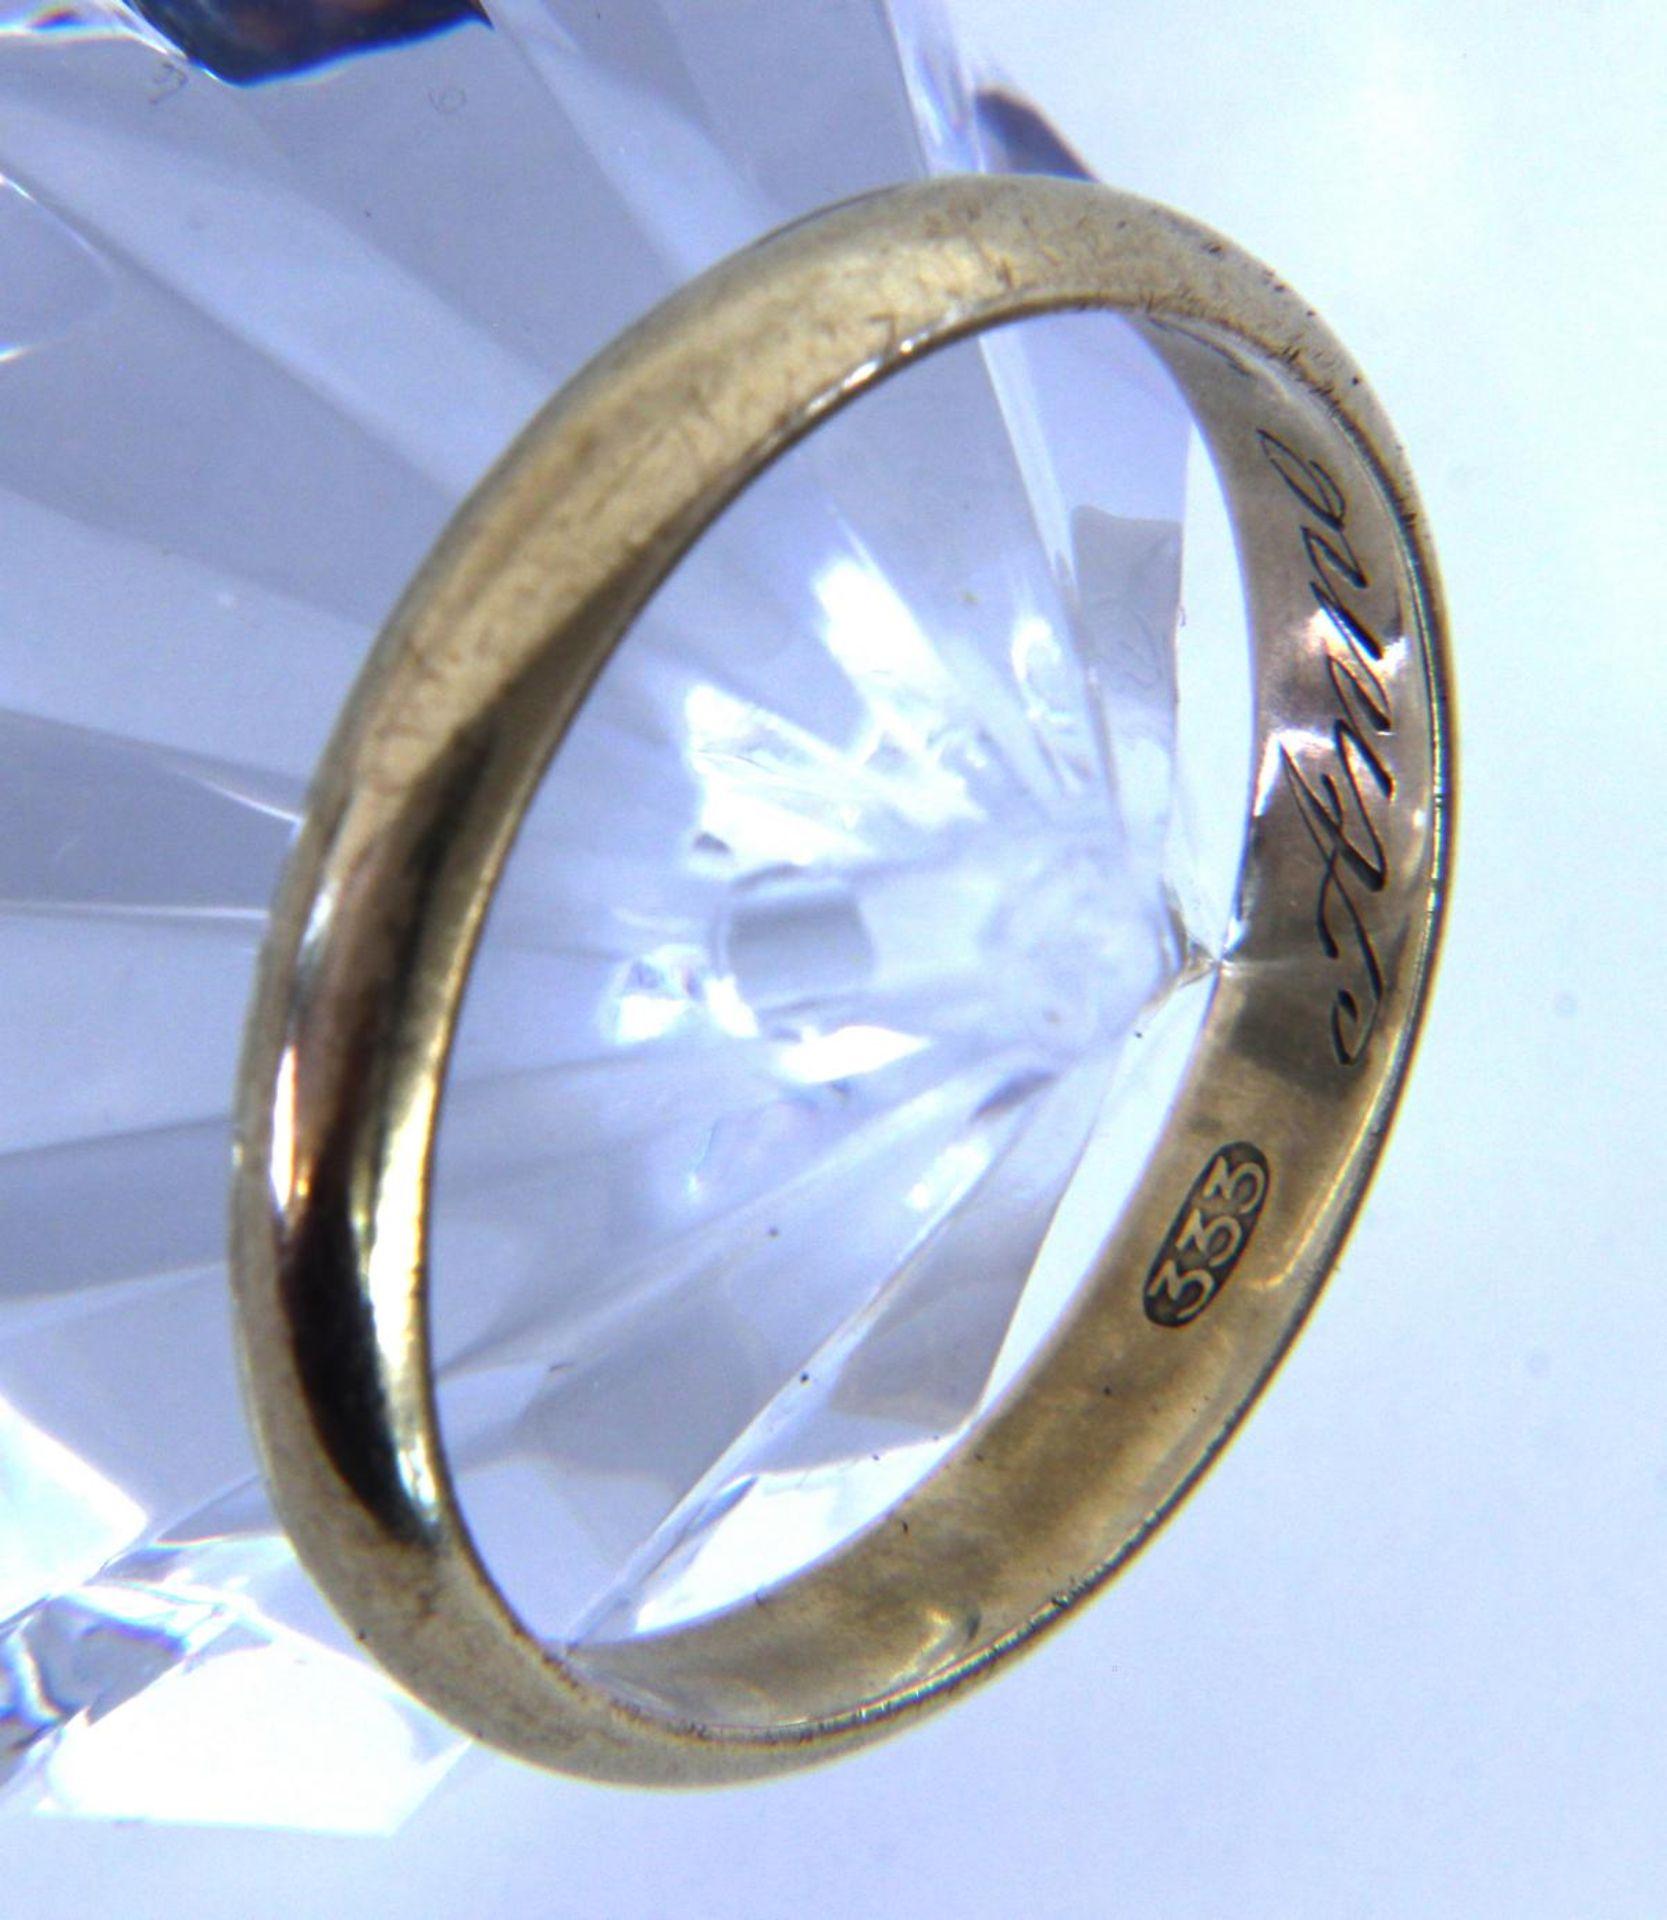 EHERING 585/000 Gelbgold. Ringgr. 62.